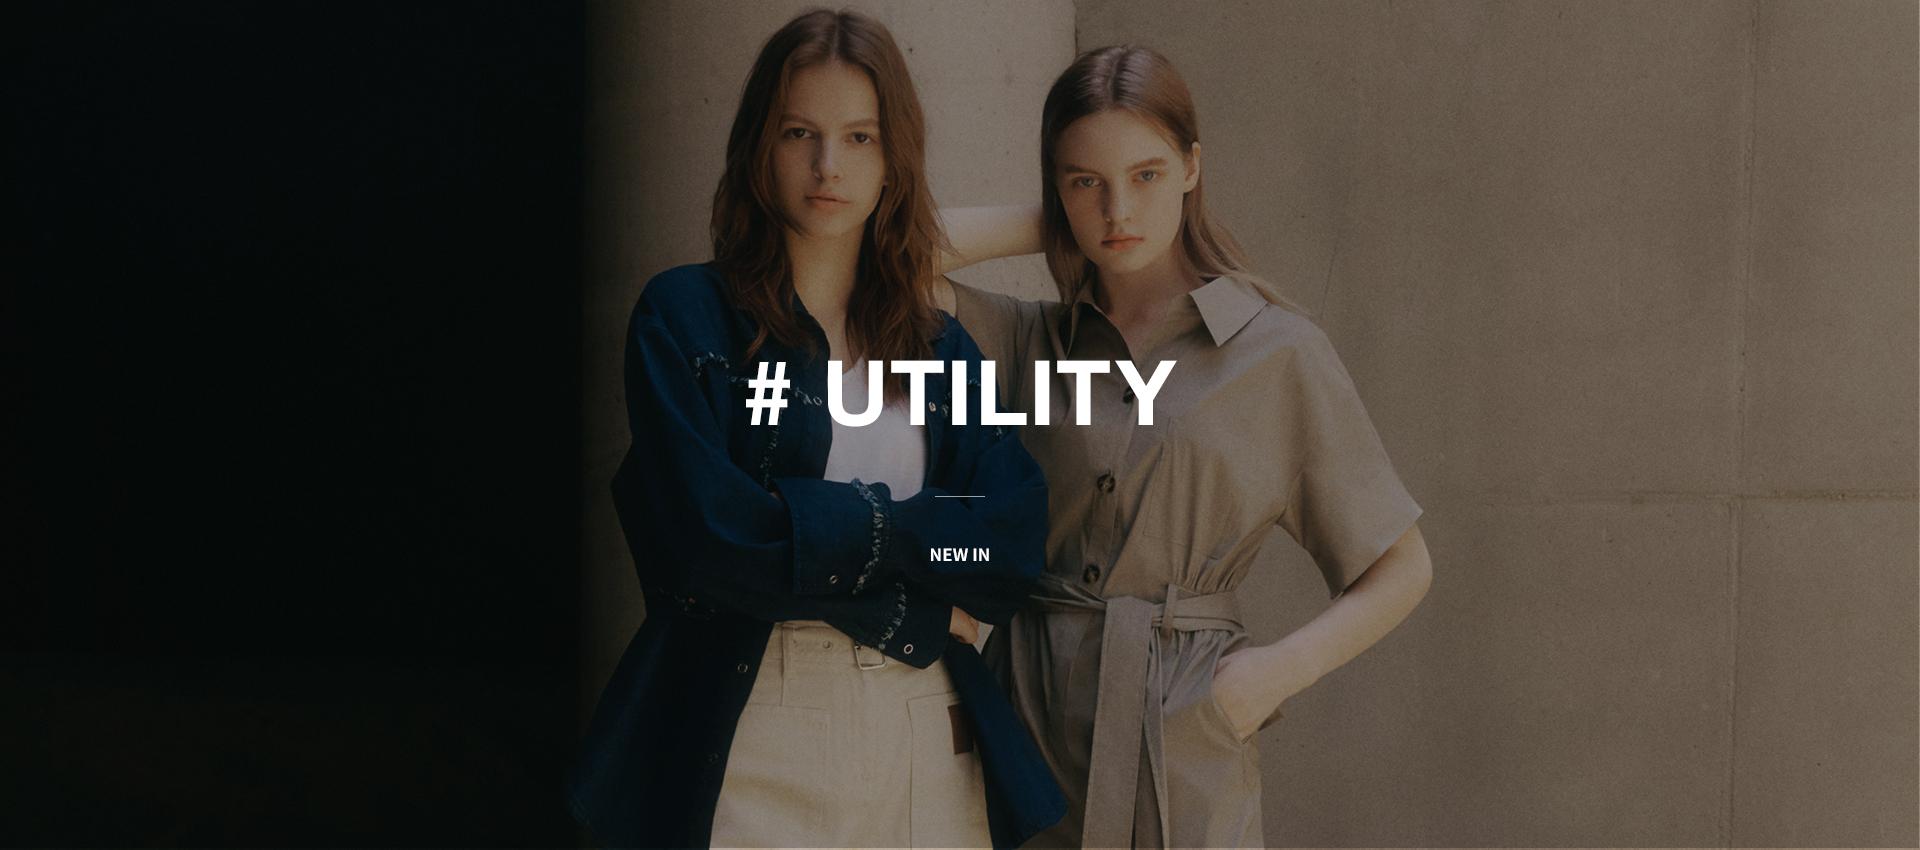 # Utility